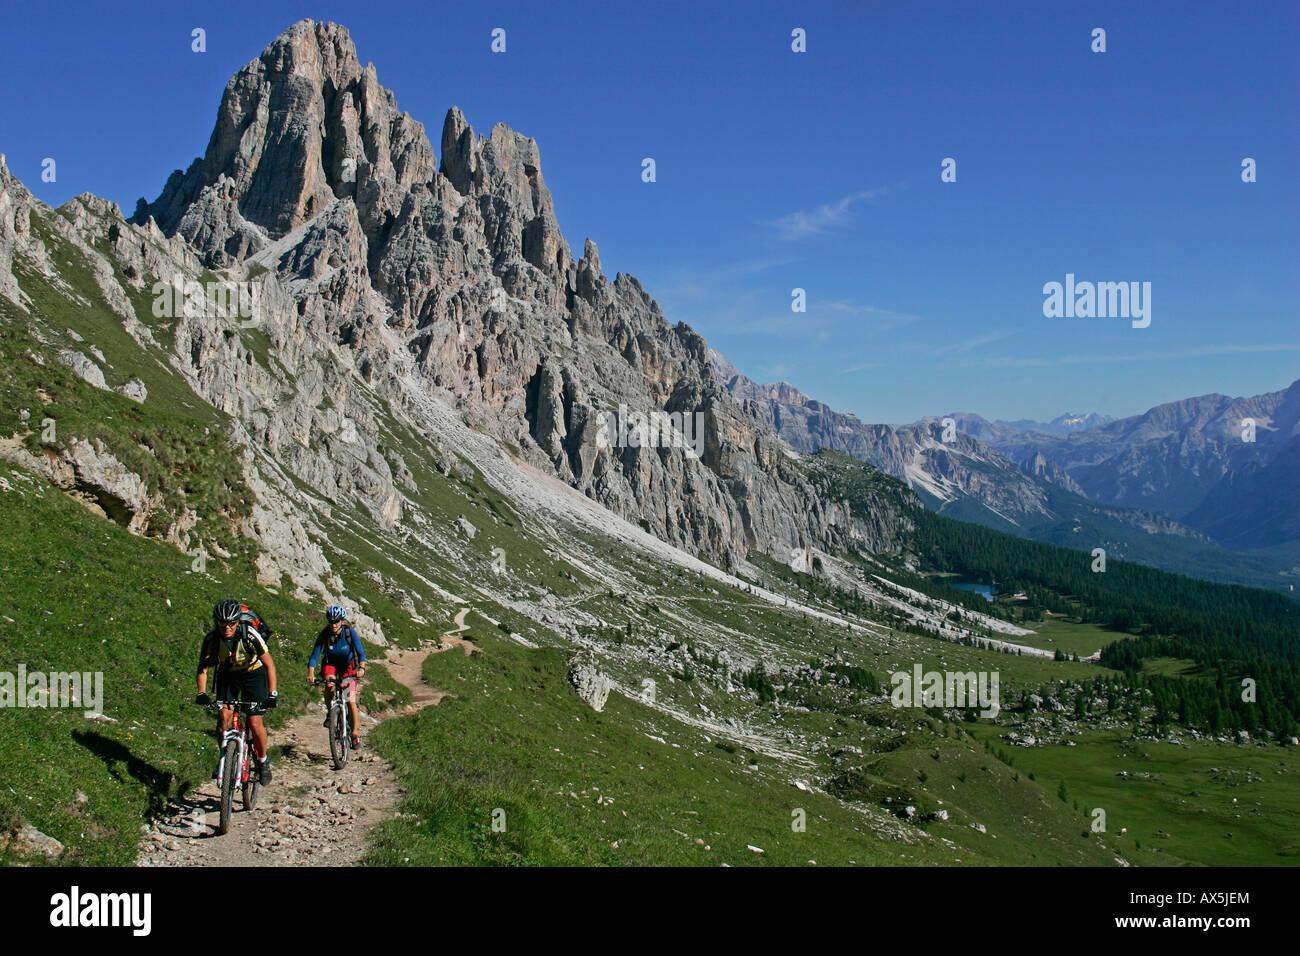 Weibliche Mountainbiker, Cima d'ambrizzola, Lago di fedara, Dolomiten, Norditalien, Europa Stockbild